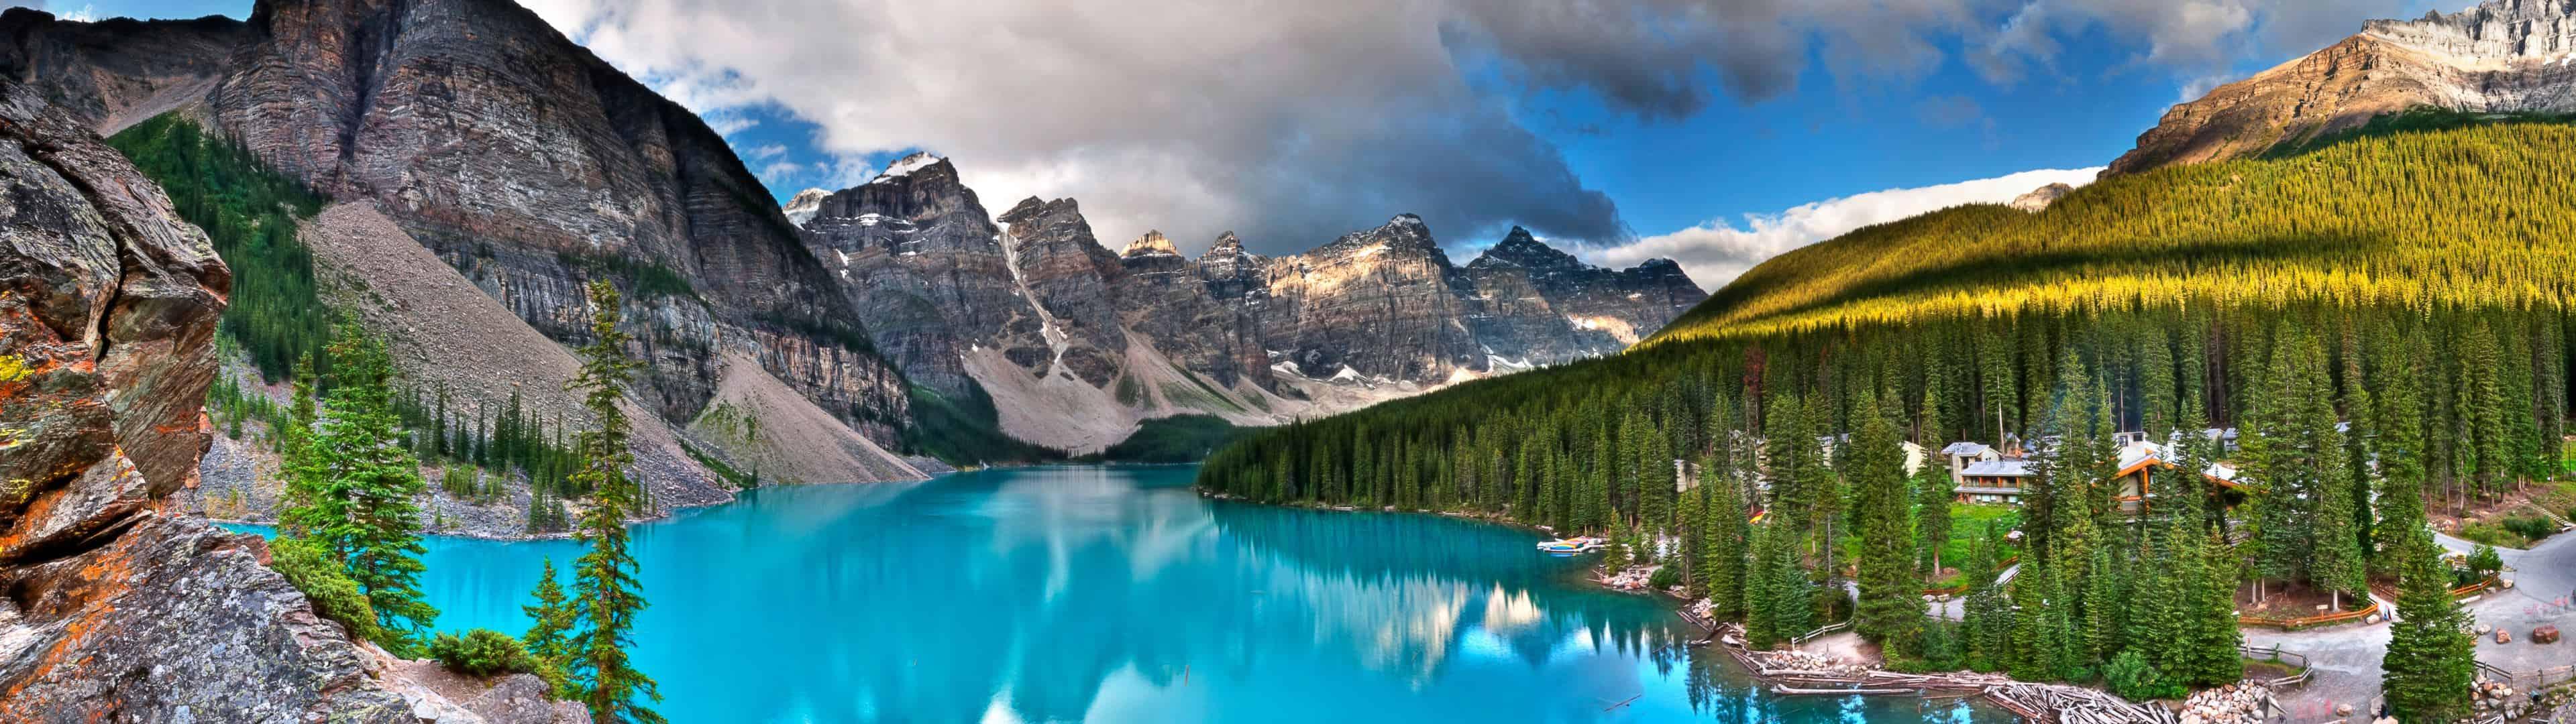 moraine lake banff national park canada dual monitor wallpaper